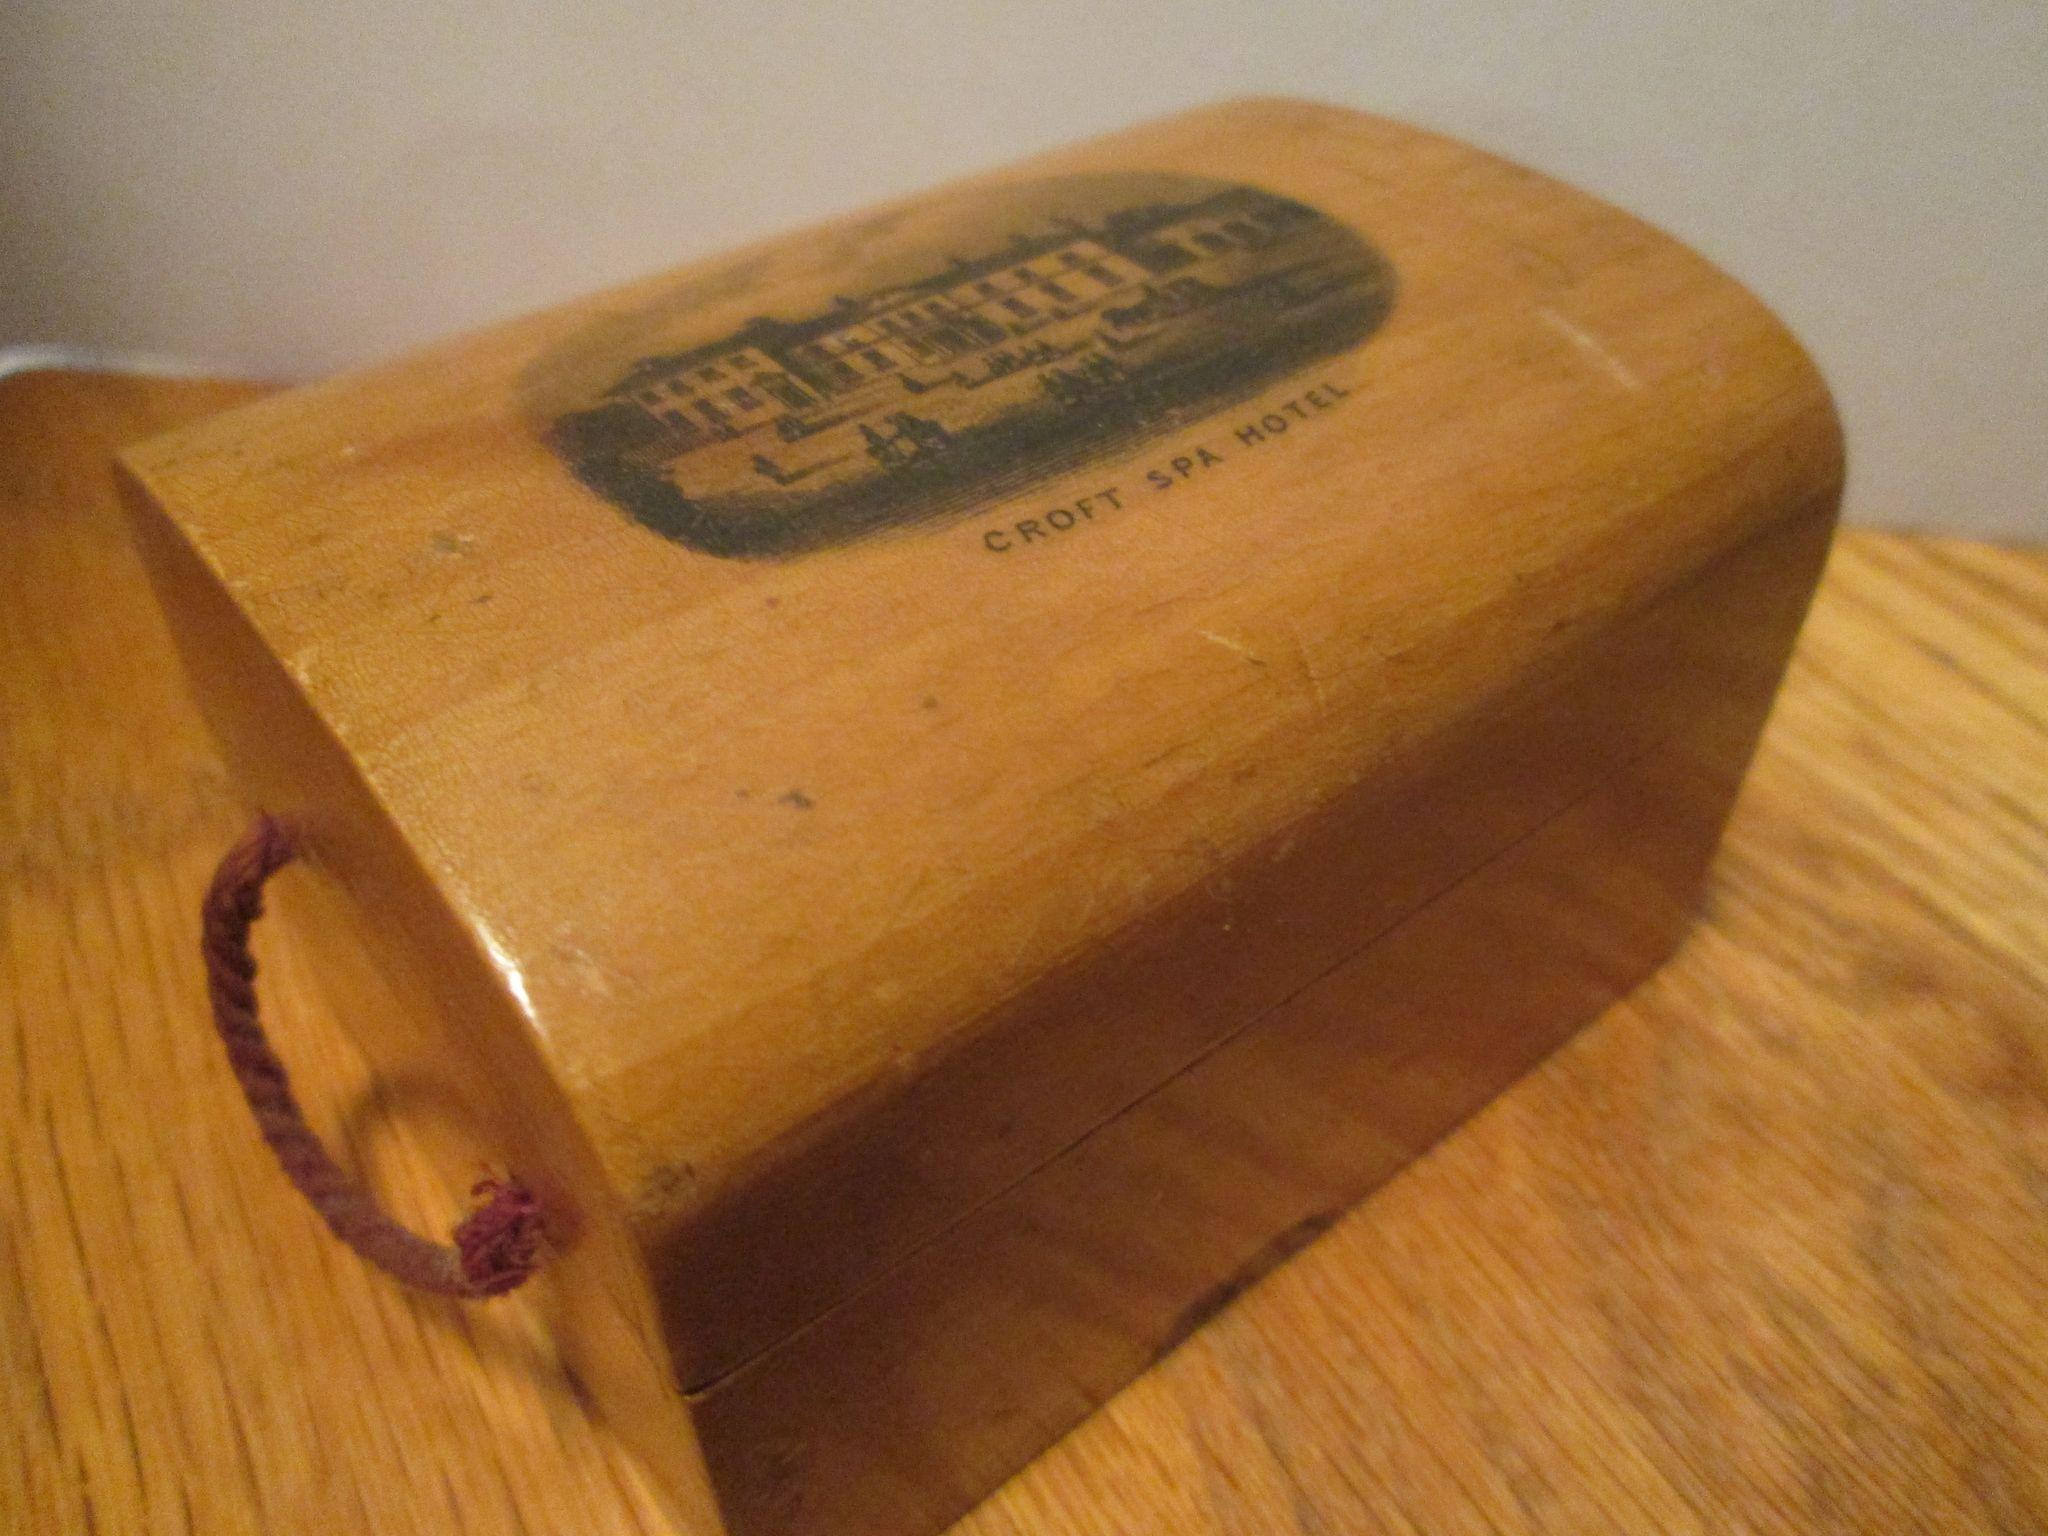 Mauchline Ware Box Miniature Trunk / Souvenir of the Victorian Croft Spa Hotel in England